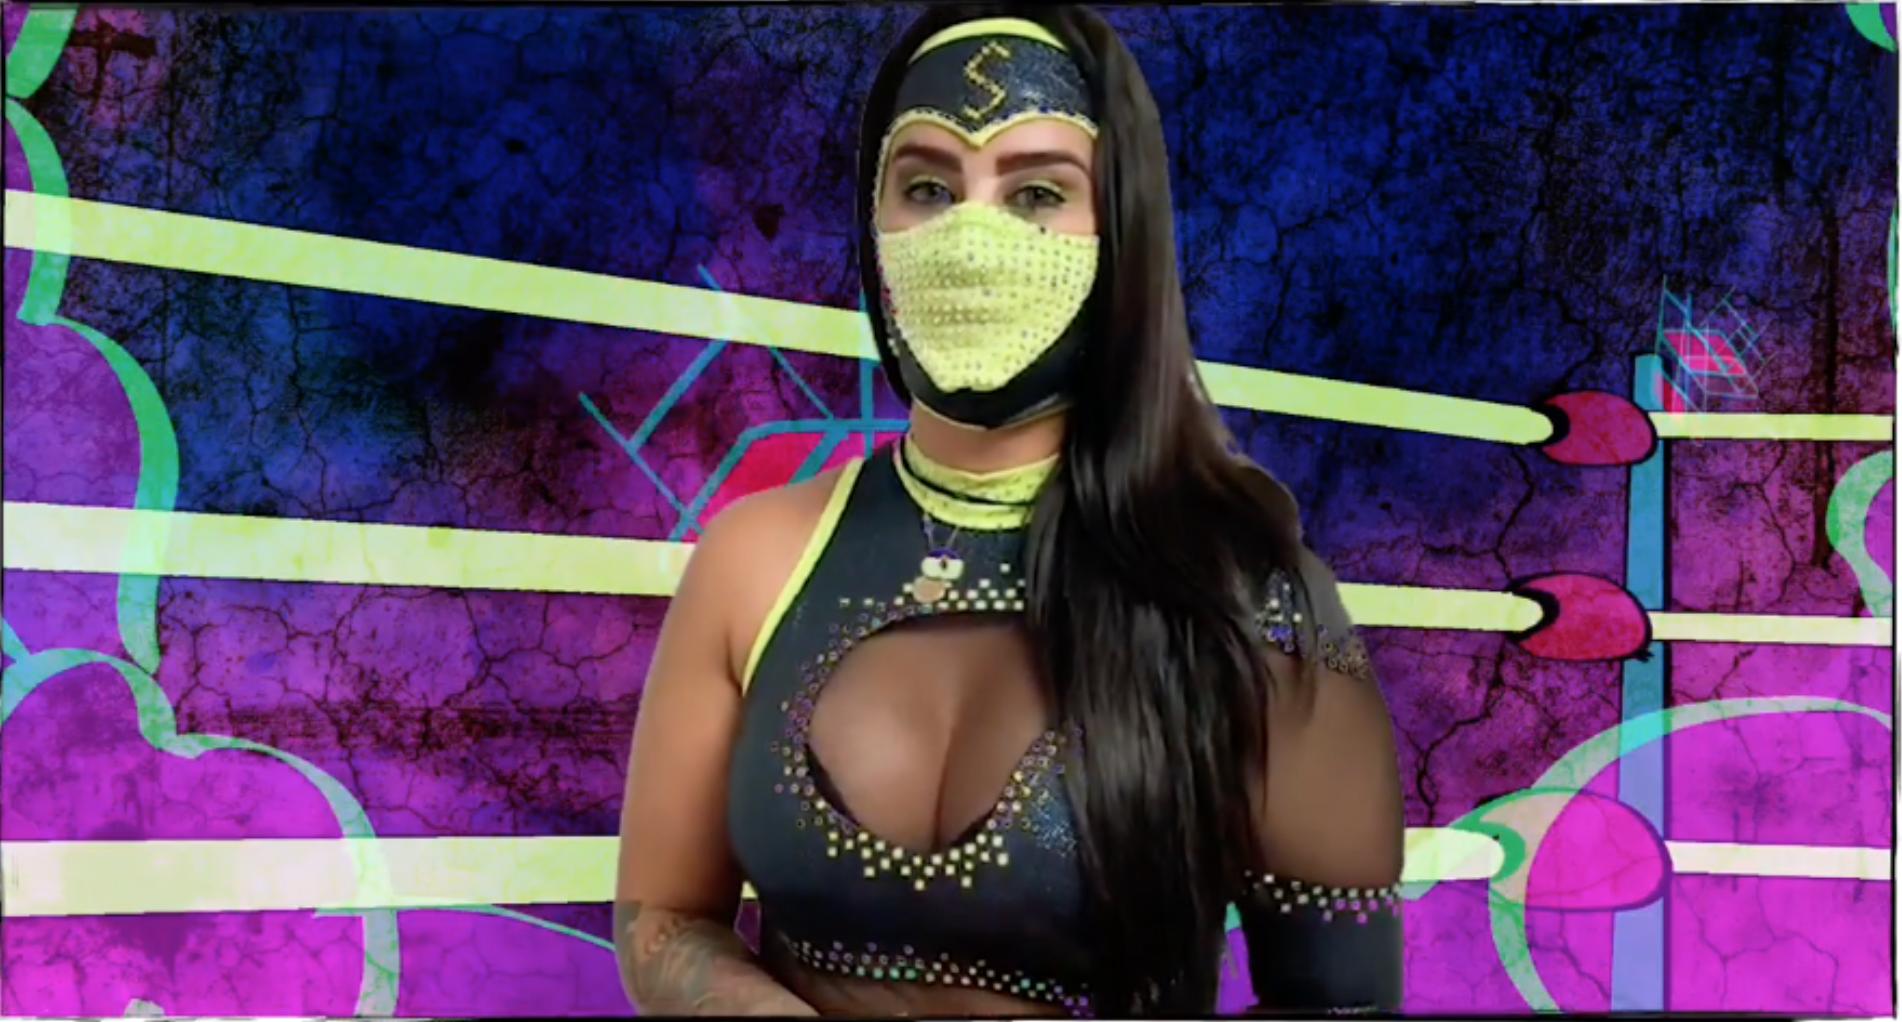 La luchadora Lady Shani revela un momento vivido mientras luchaba